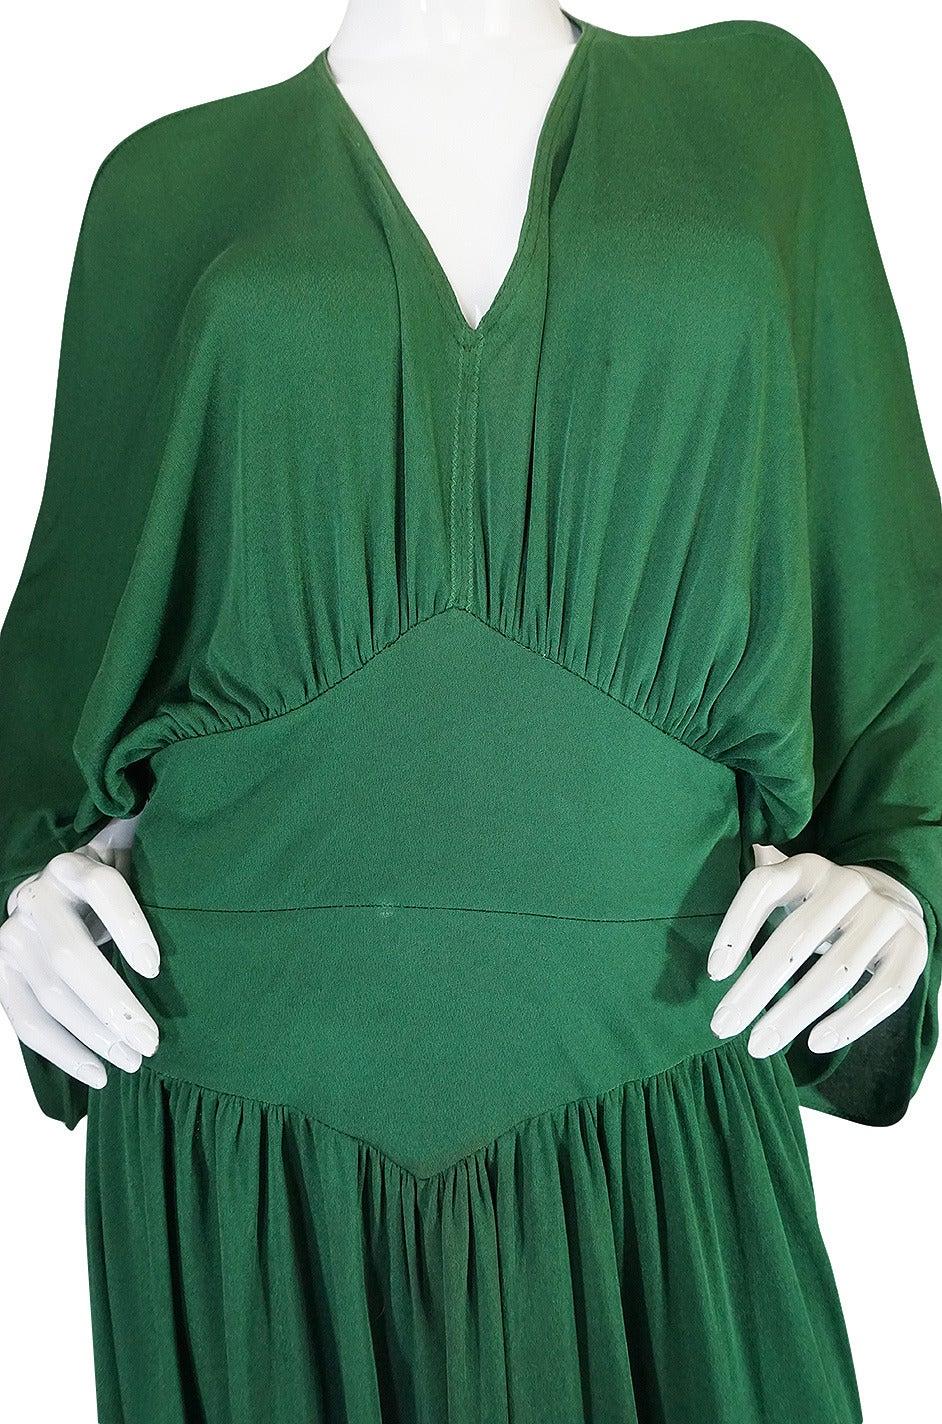 1960s Jean Patou Demi-Couture Green Jersey Caftan Dress 7